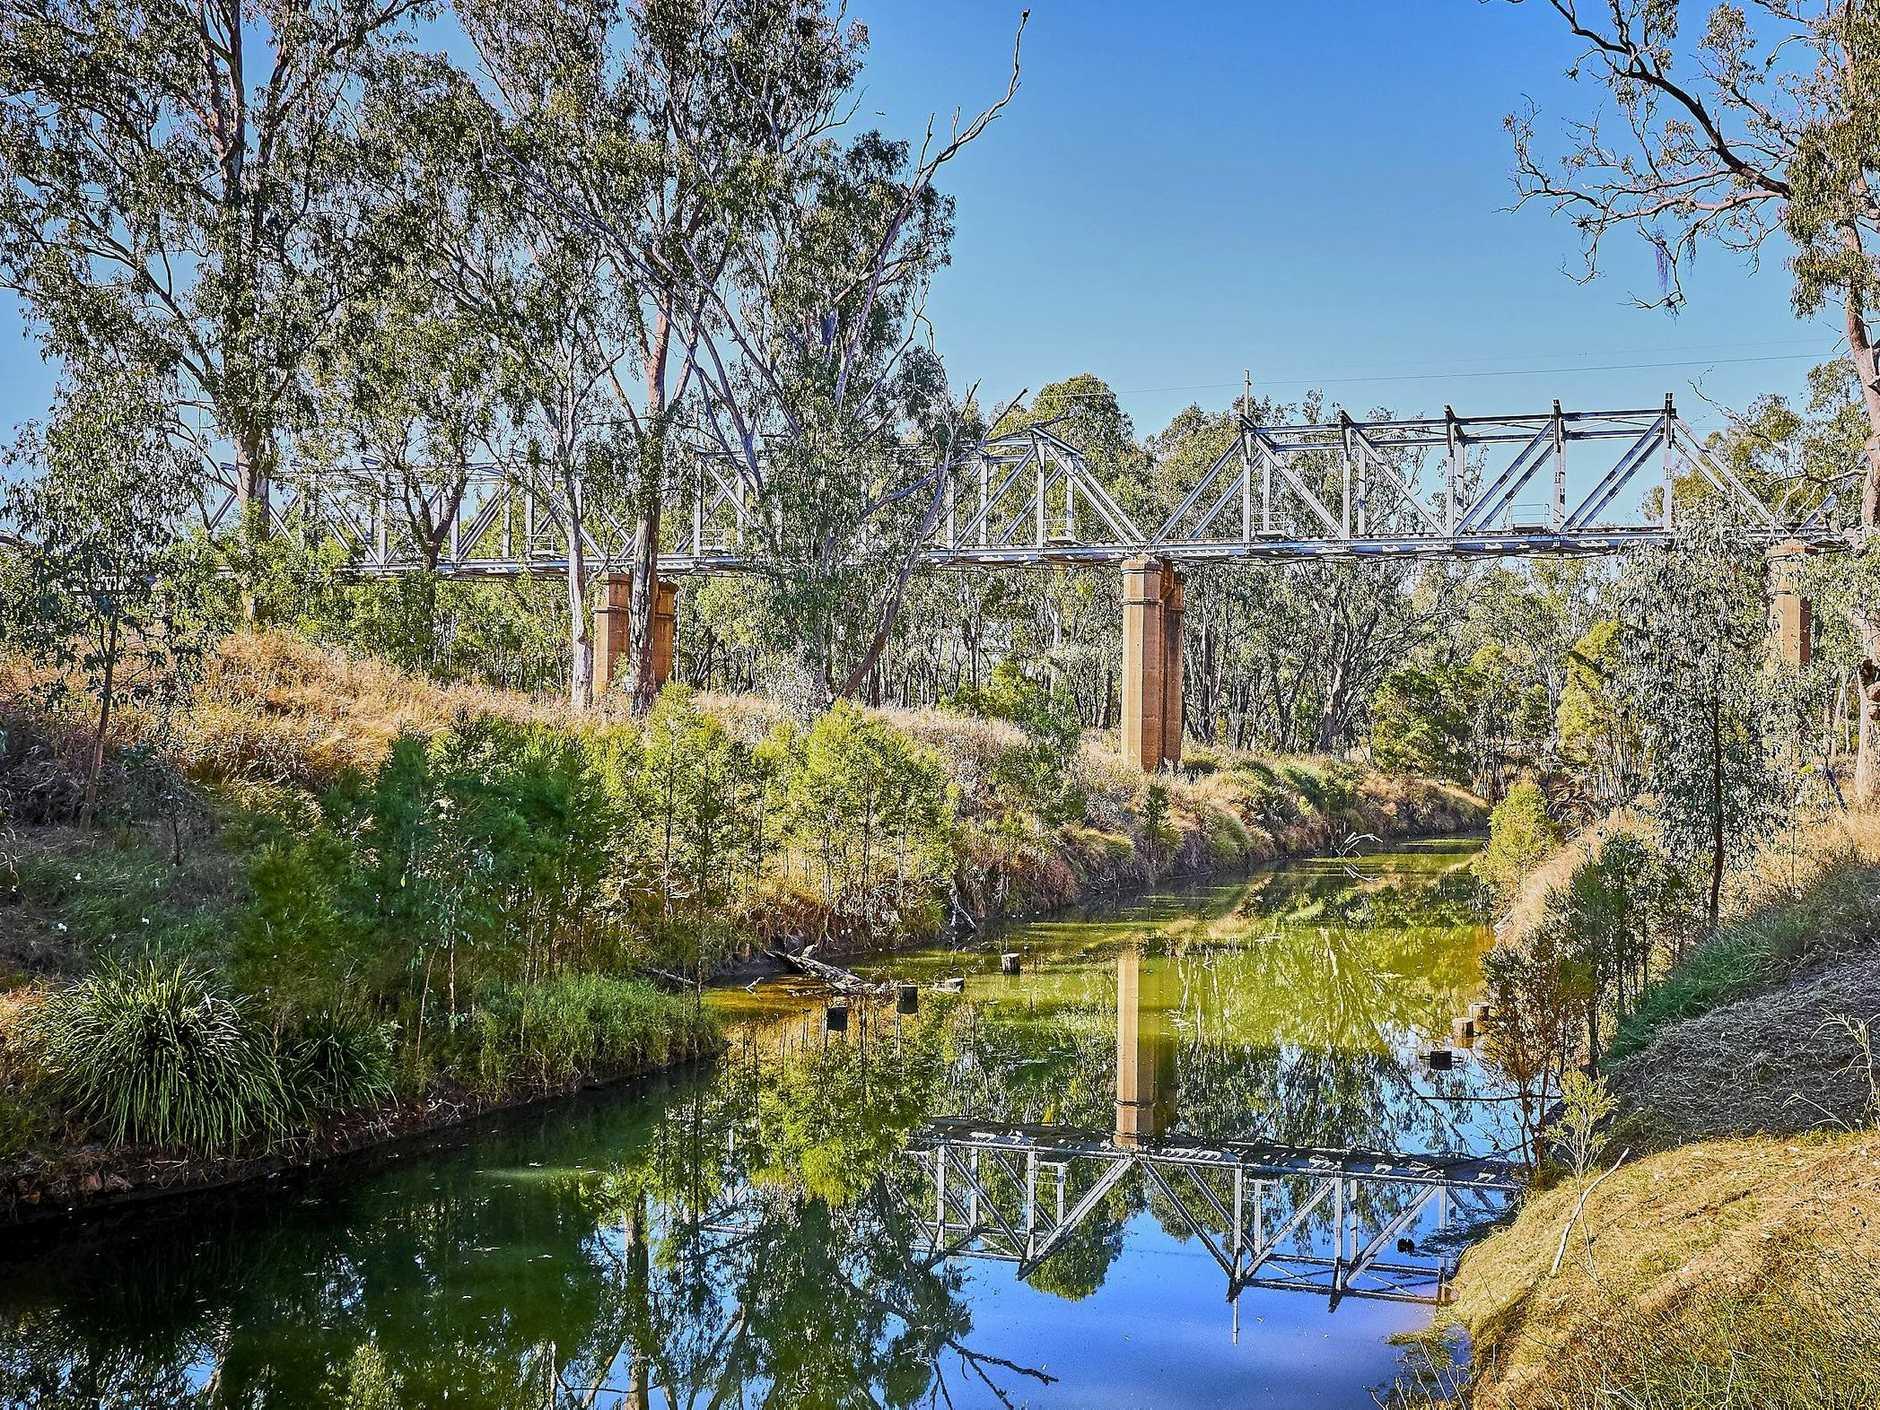 HISTORY: The original timber bridge at Comet was built in 1878.